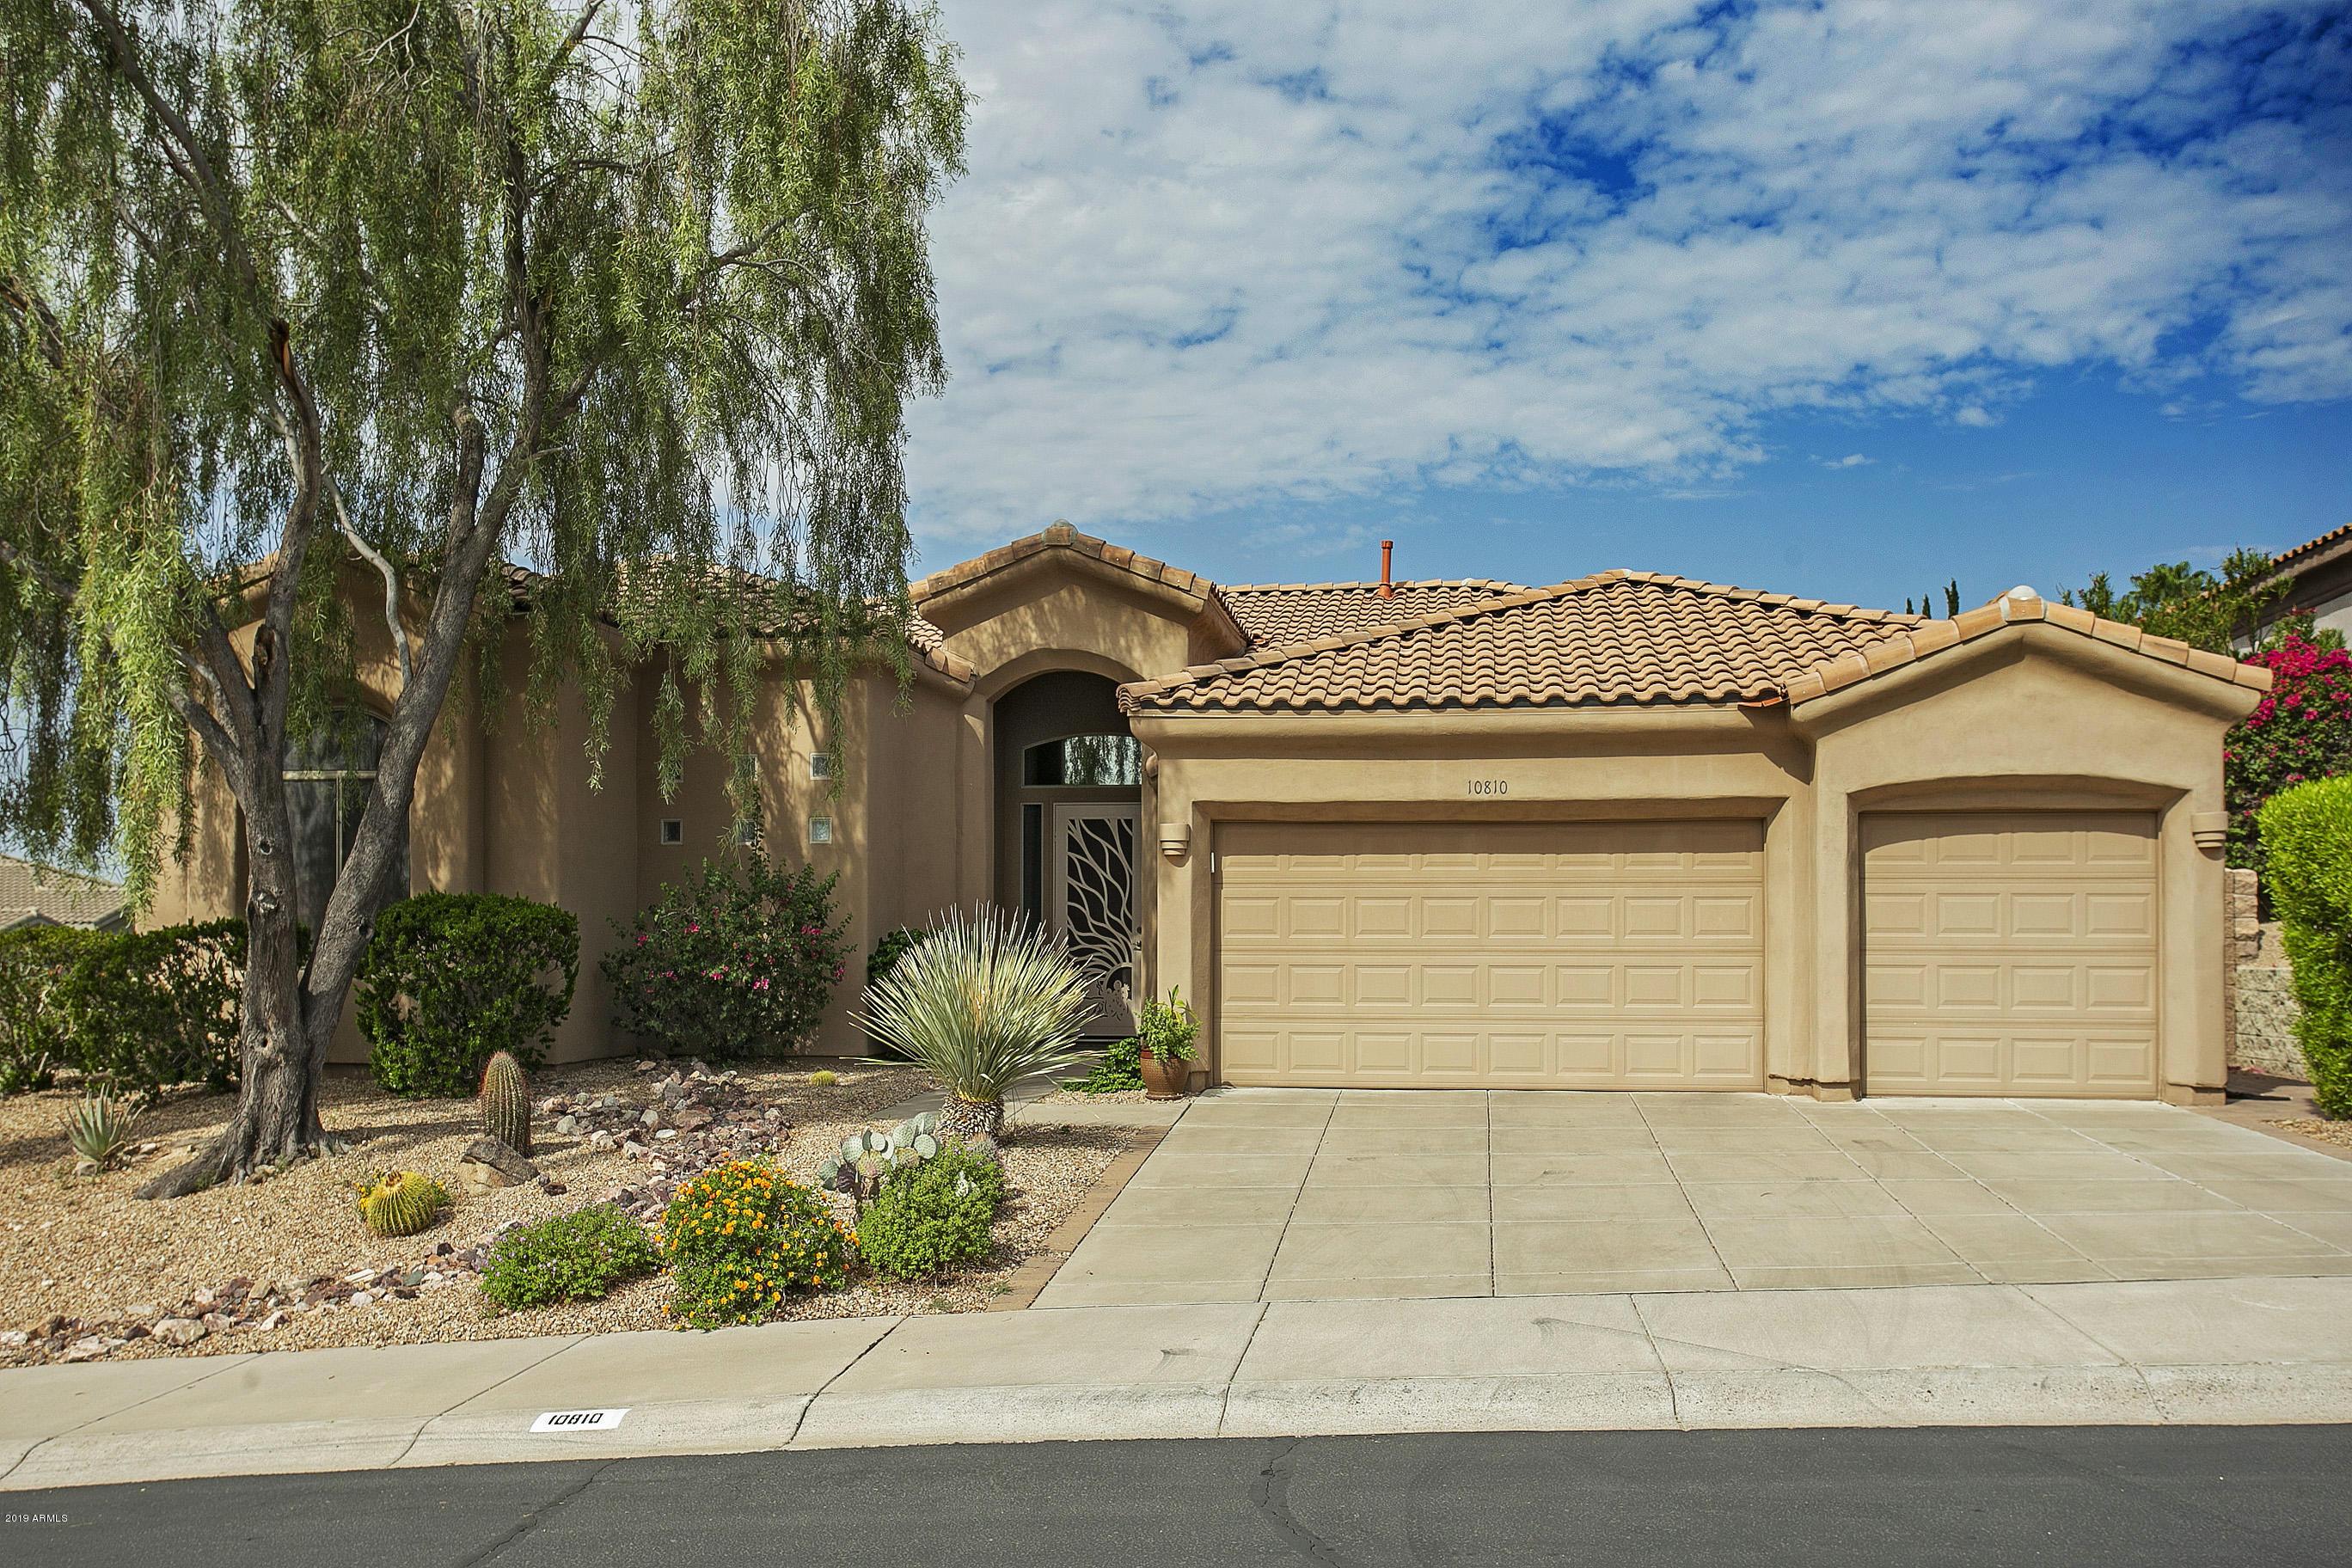 Photo of 10810 N Rosemont Court, Fountain Hills, AZ 85268